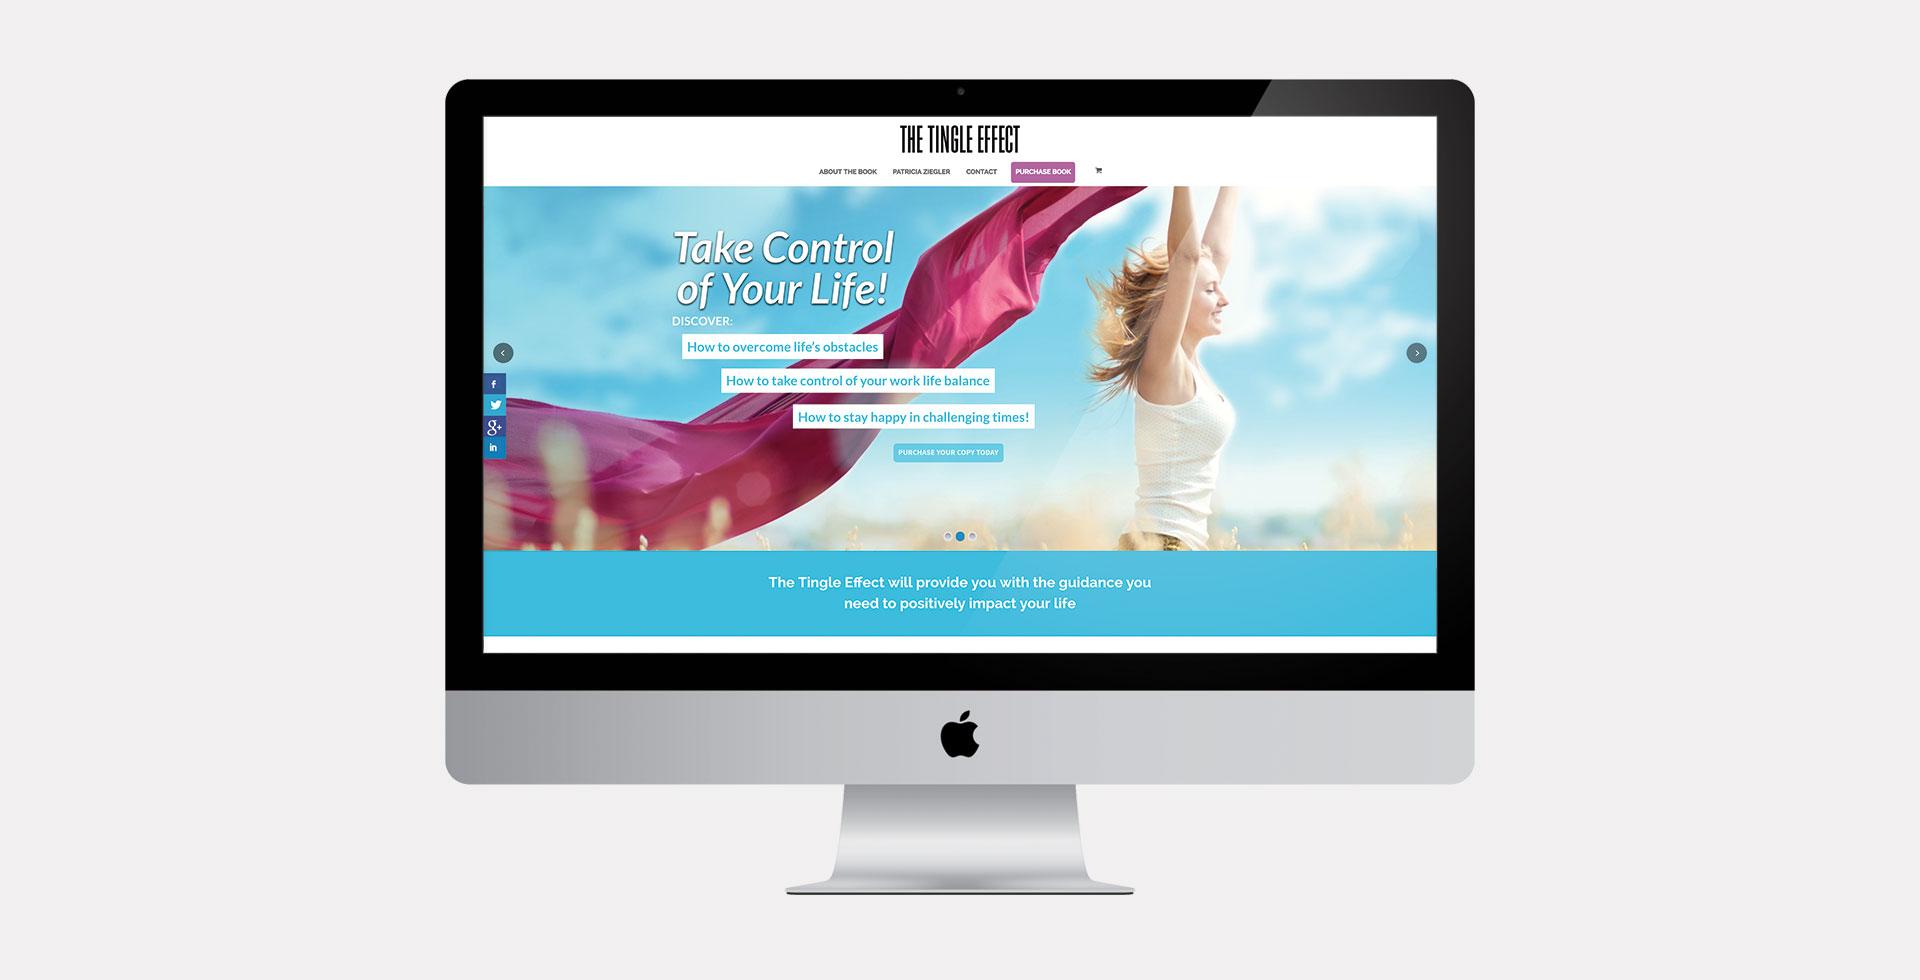 www.thetingleeffect.com